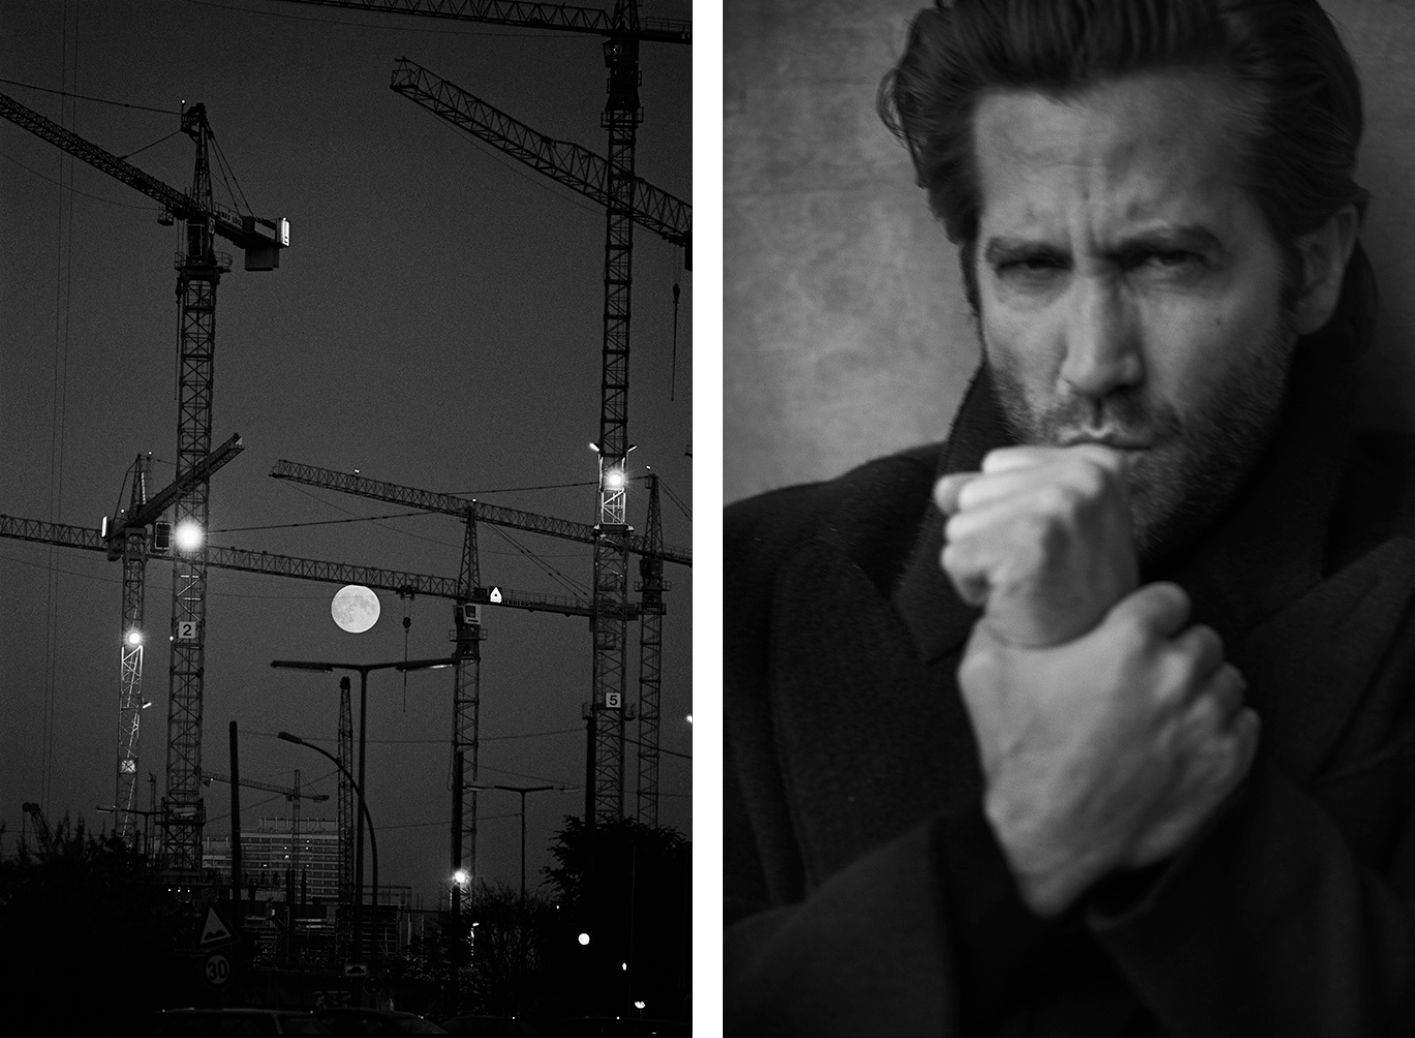 Left, Berlin, 1996 ∏ Peter Lindbergh. Right, Jake Gyllenhaal, New York, 2019 ∏ Peter Lindbergh